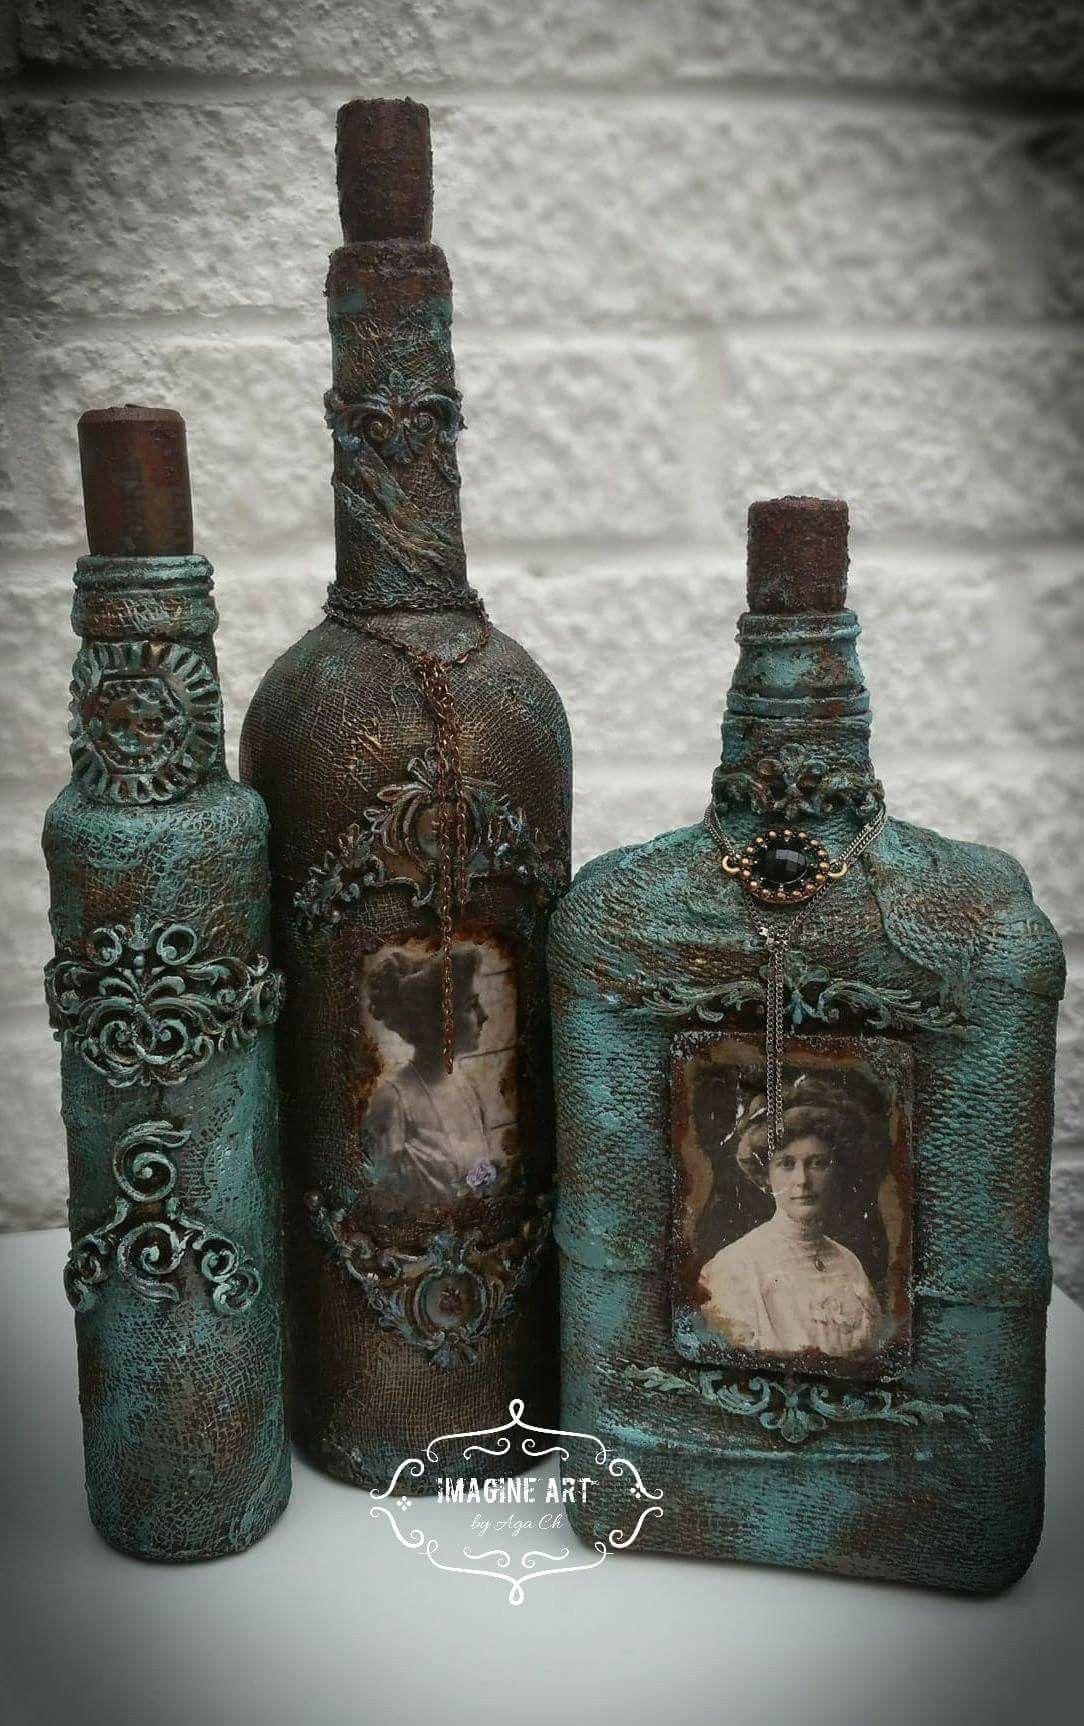 Botellas decoradas.